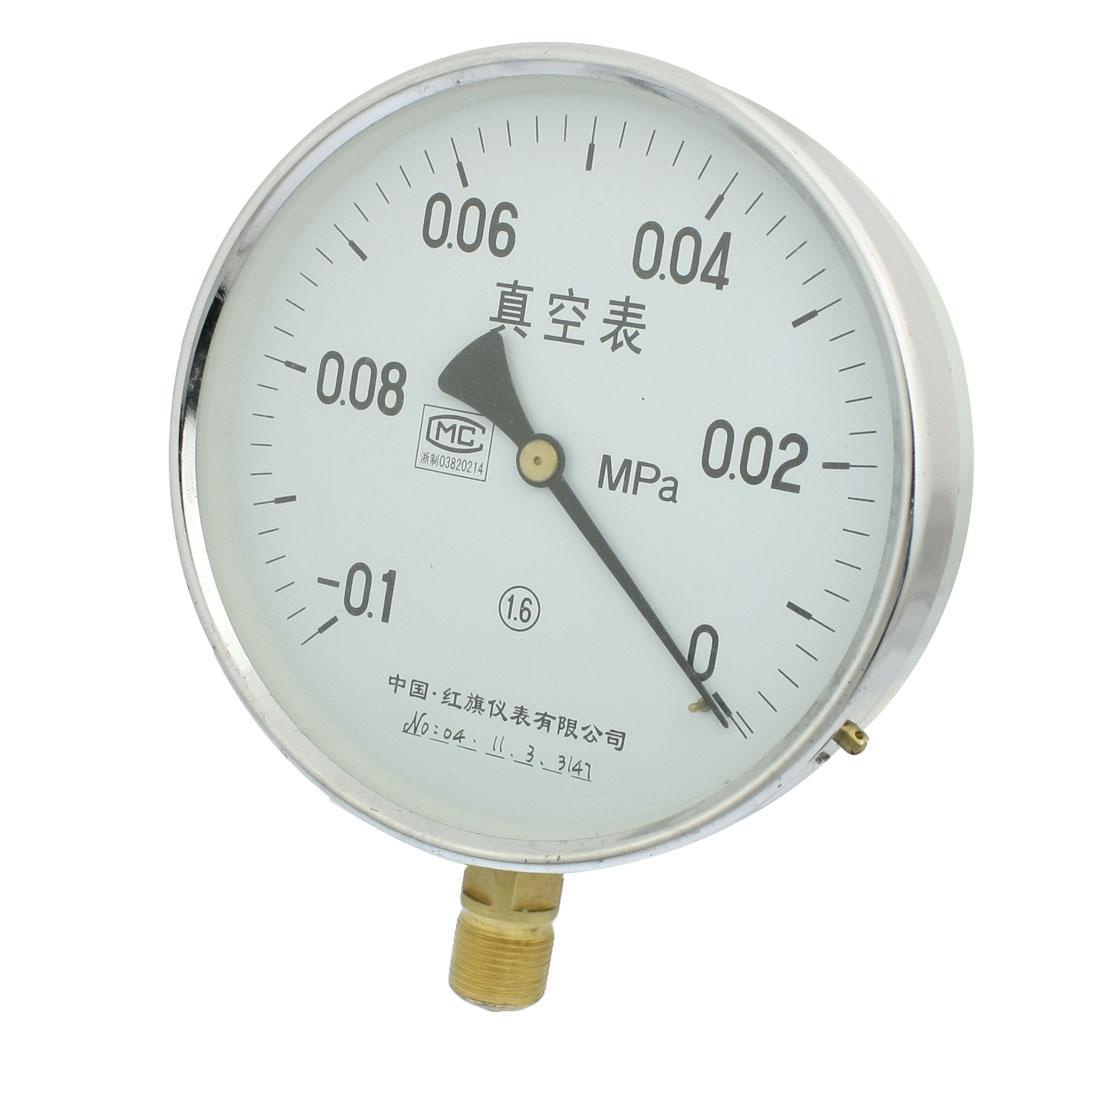 Class 1.6 -0.1-0MPa 20mm Thread Diameter Water Air Pressure Gauge